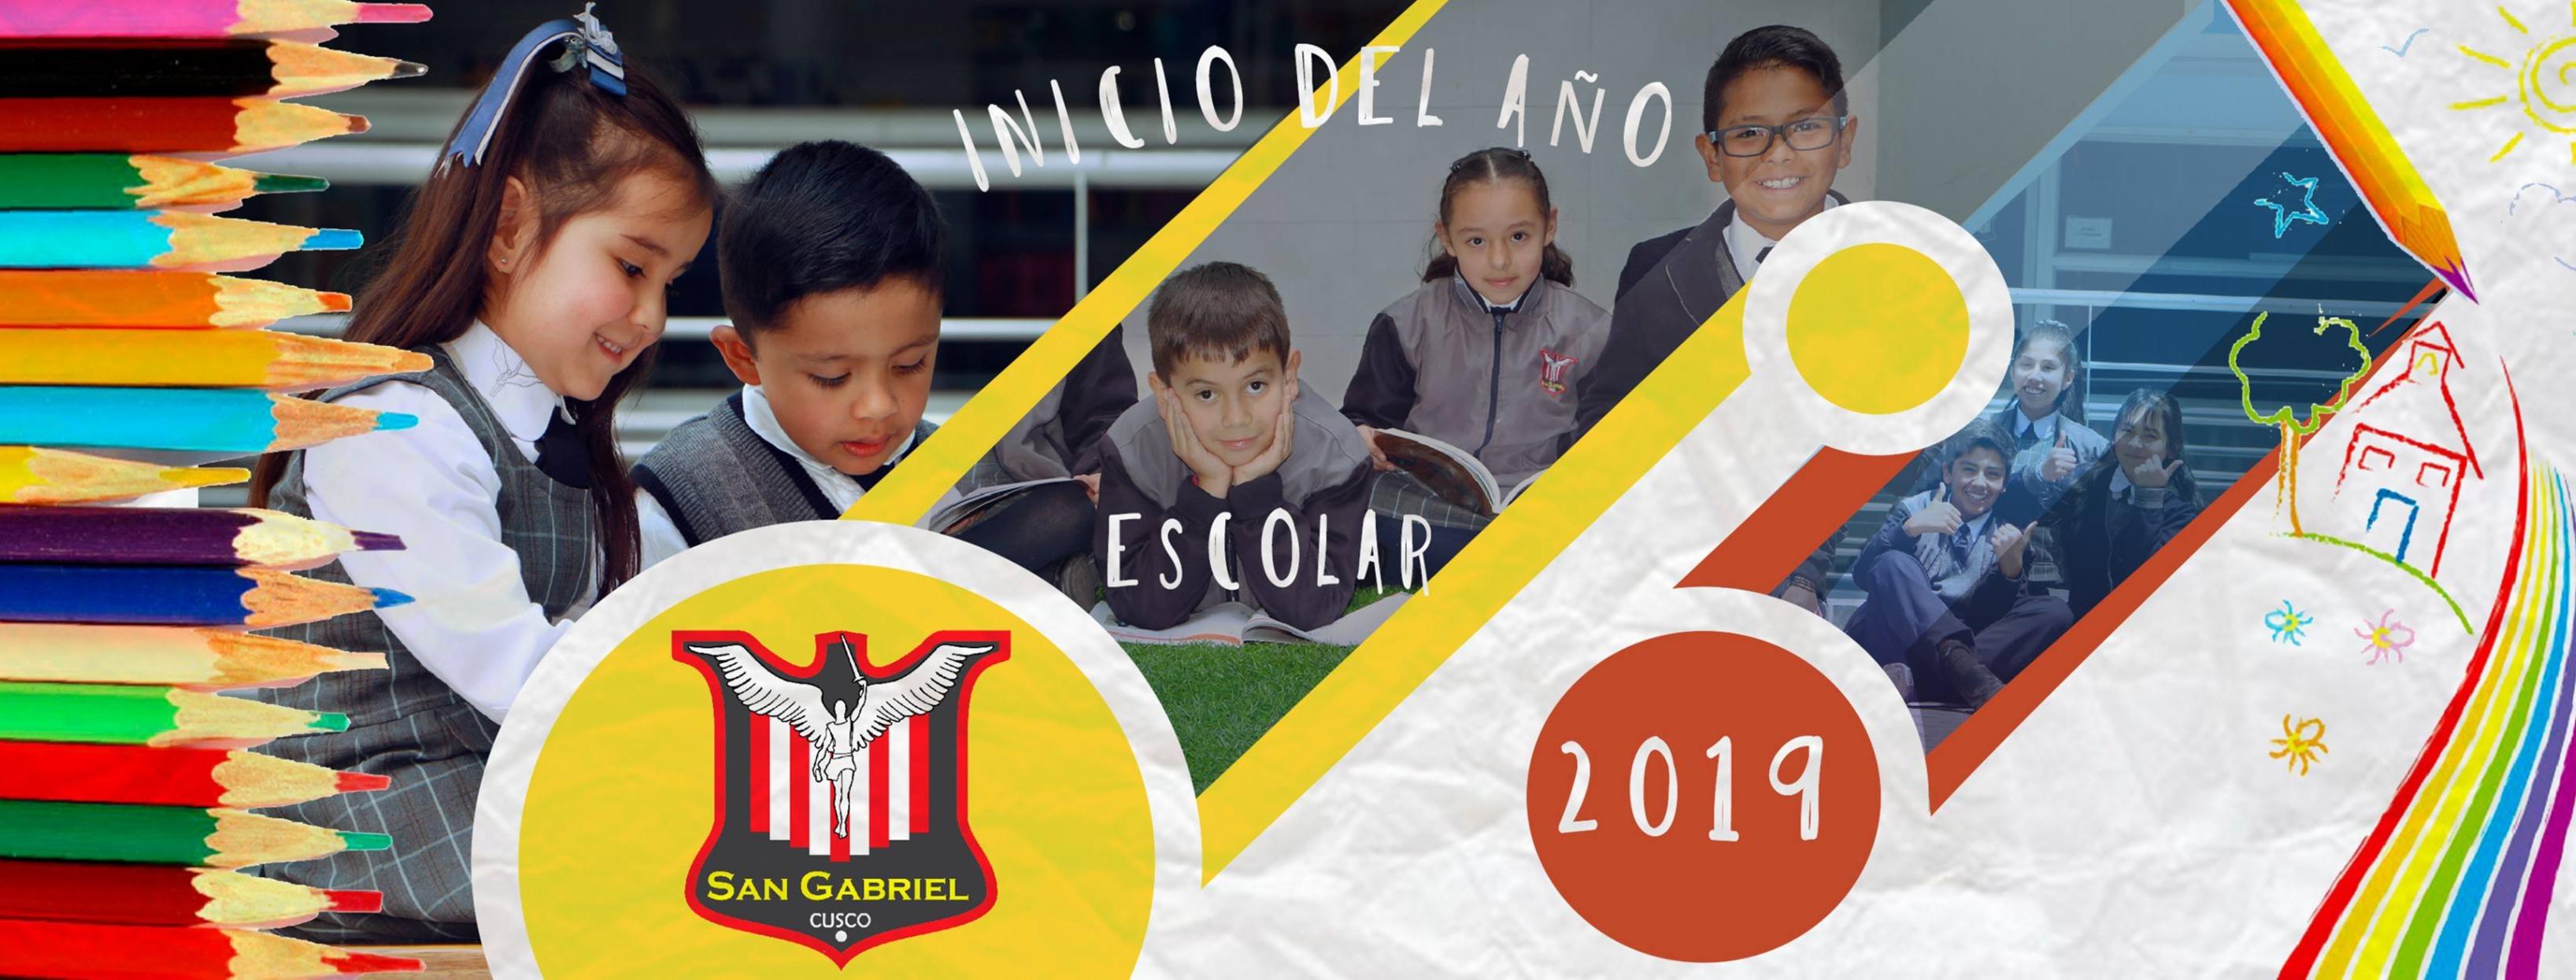 Portada Colegio San Gabriel Cusco